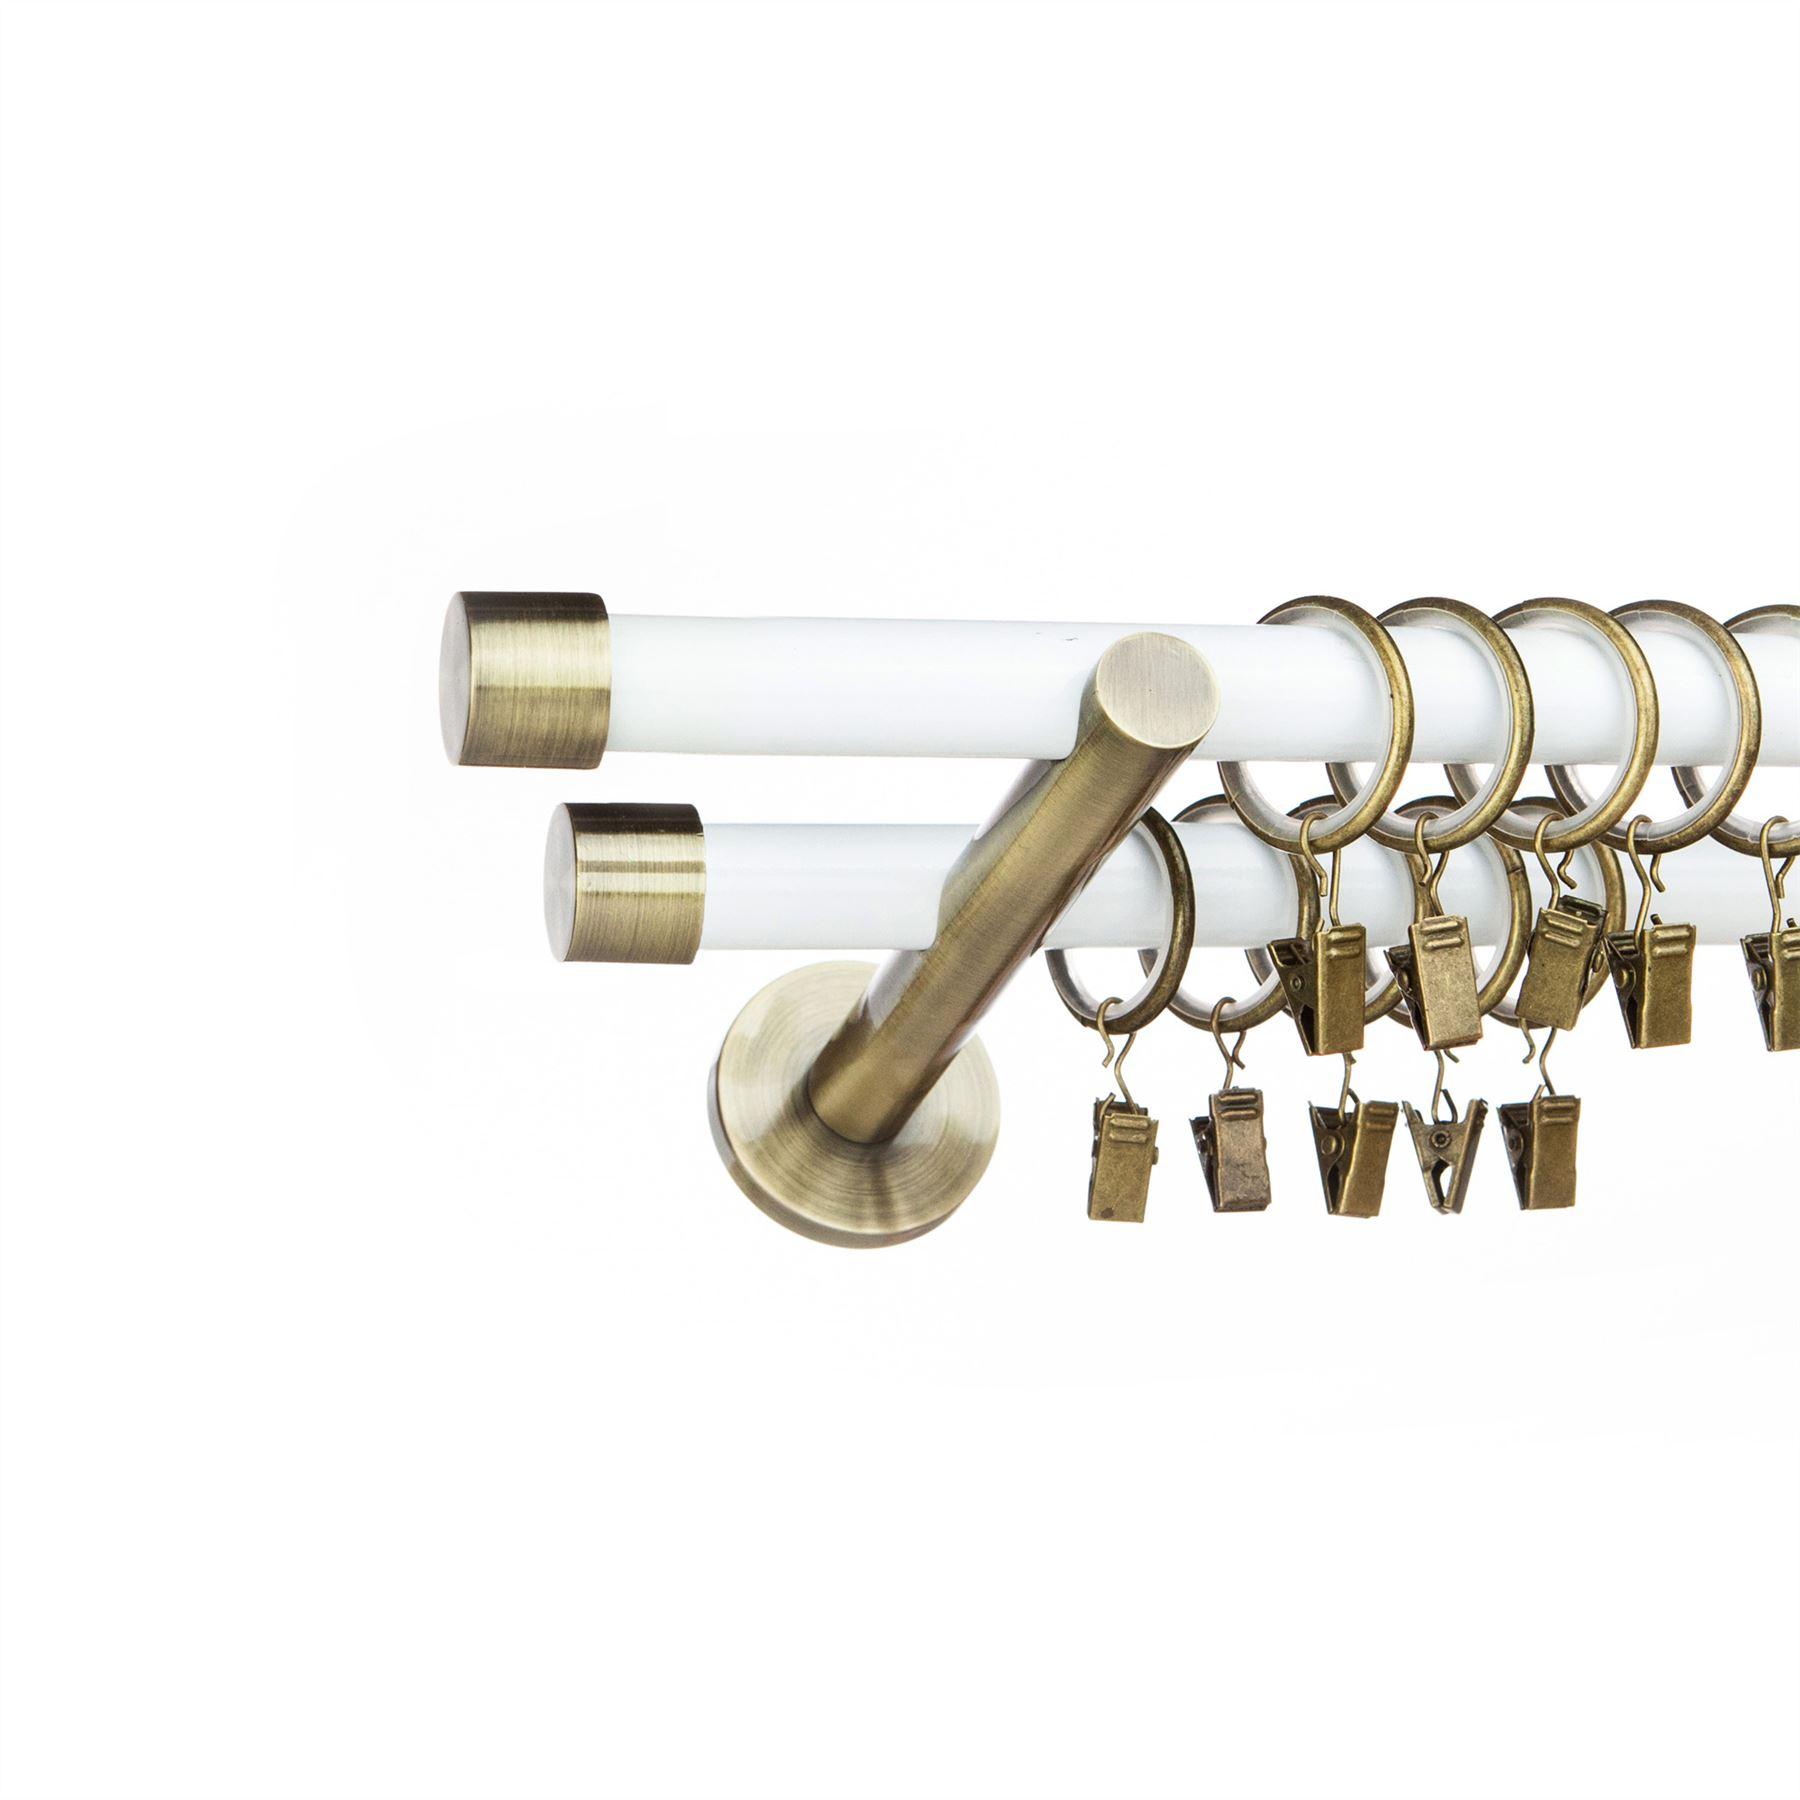 Metal Double Curtain Pole /Rod Set 19/19mm Antique Brass